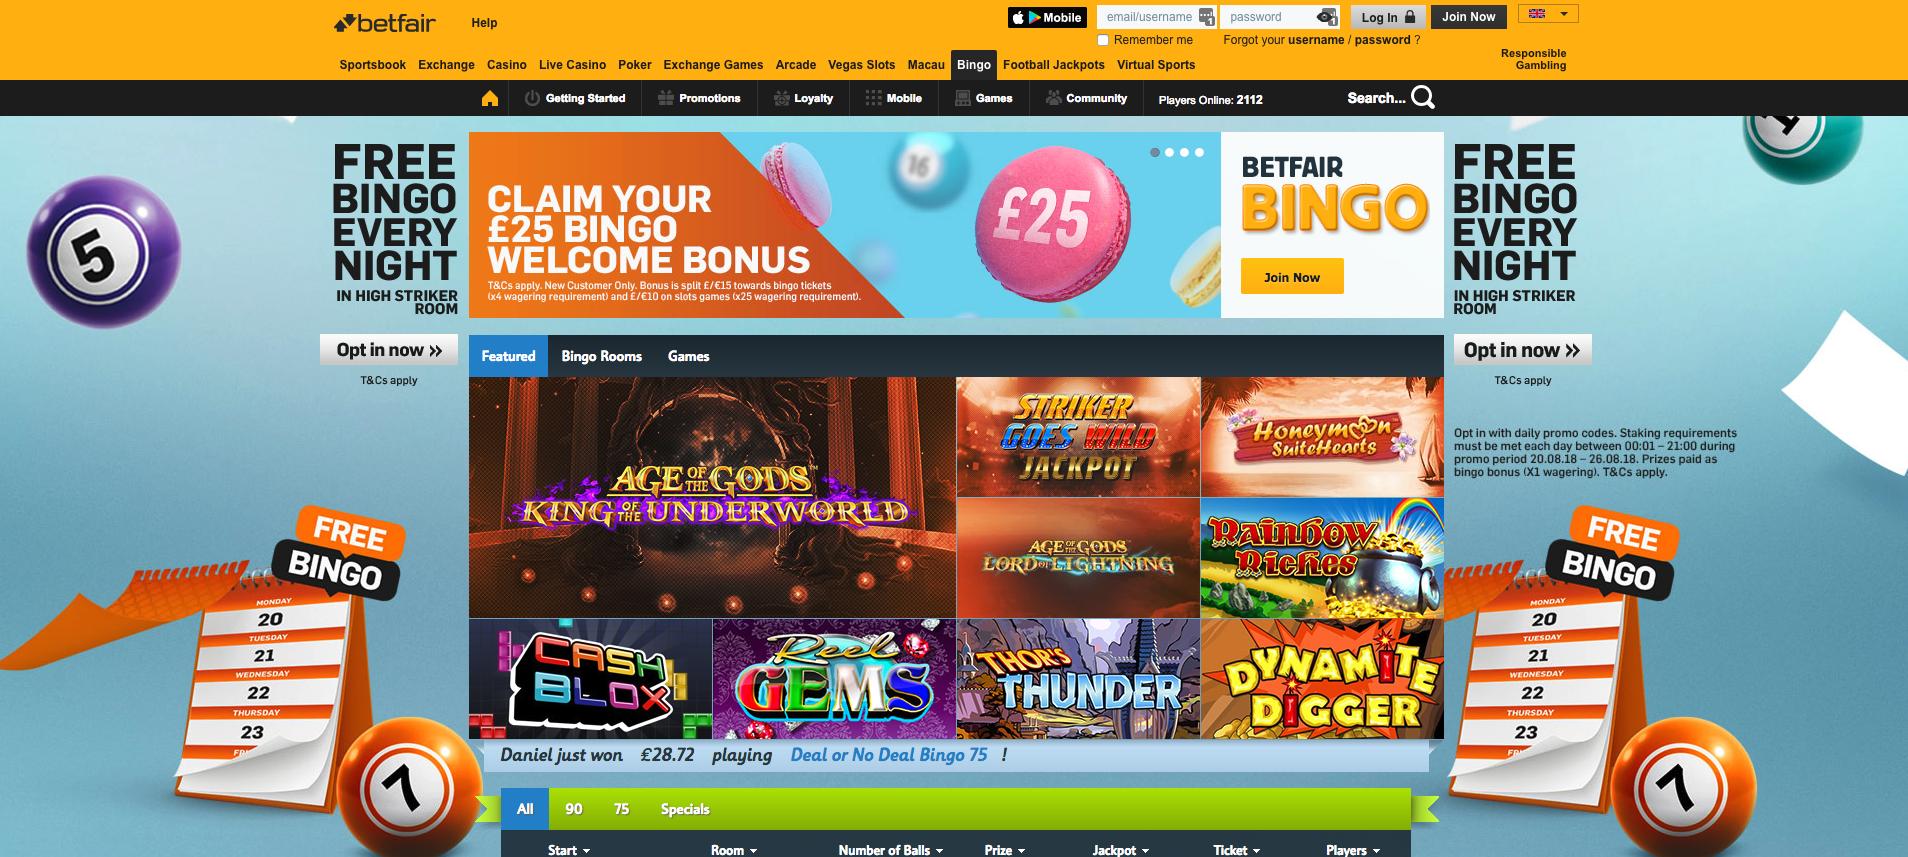 Betfair casino Portugal bingo online-106084